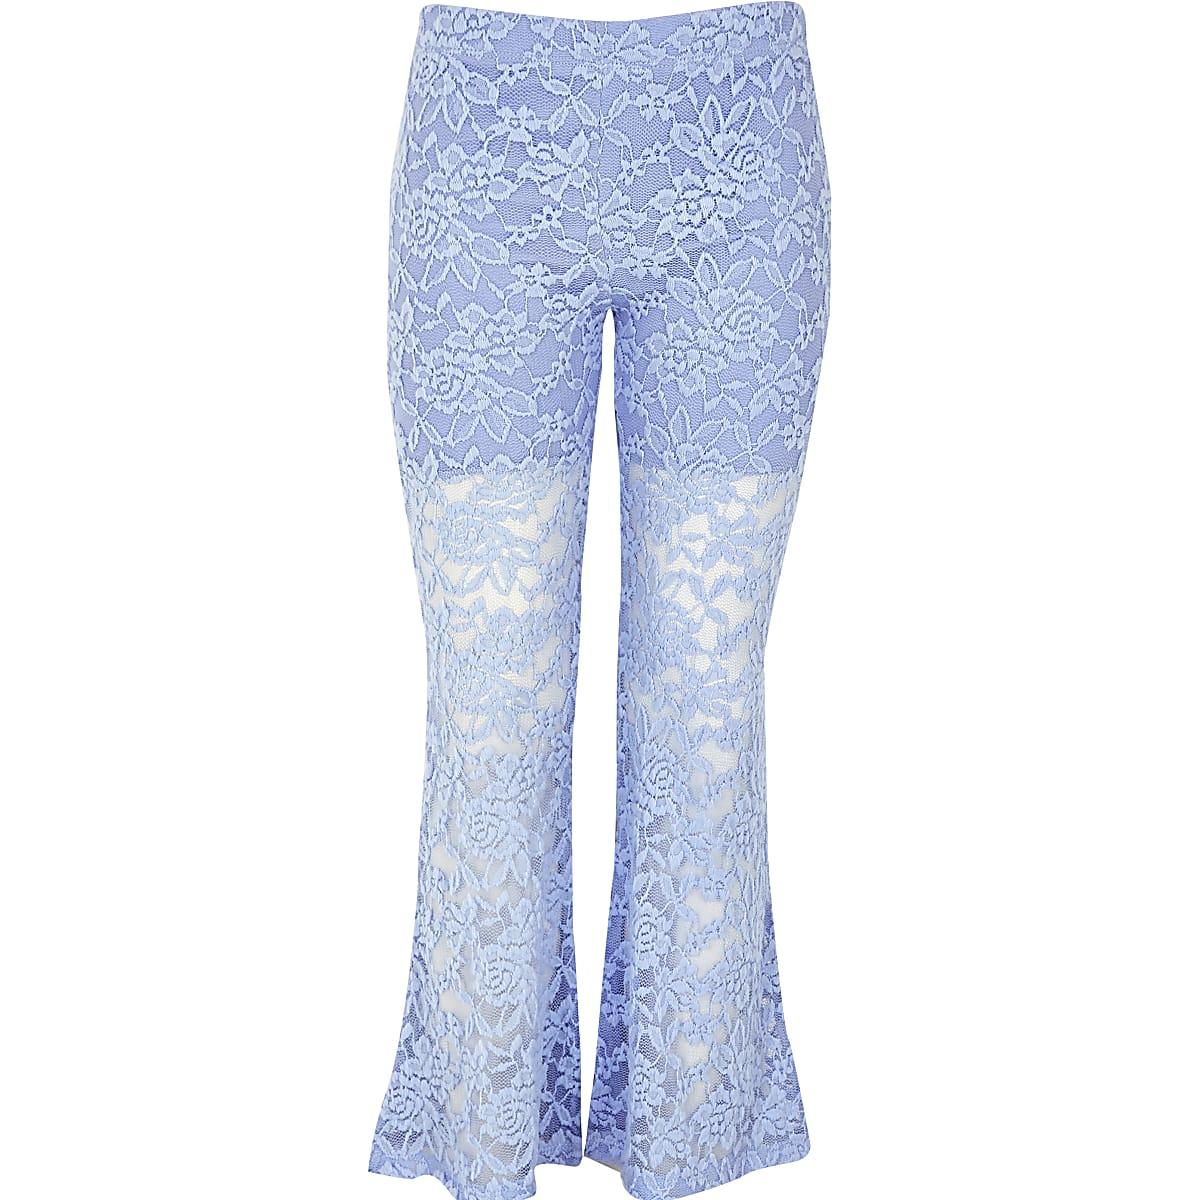 Girls light blue lace floral leggings